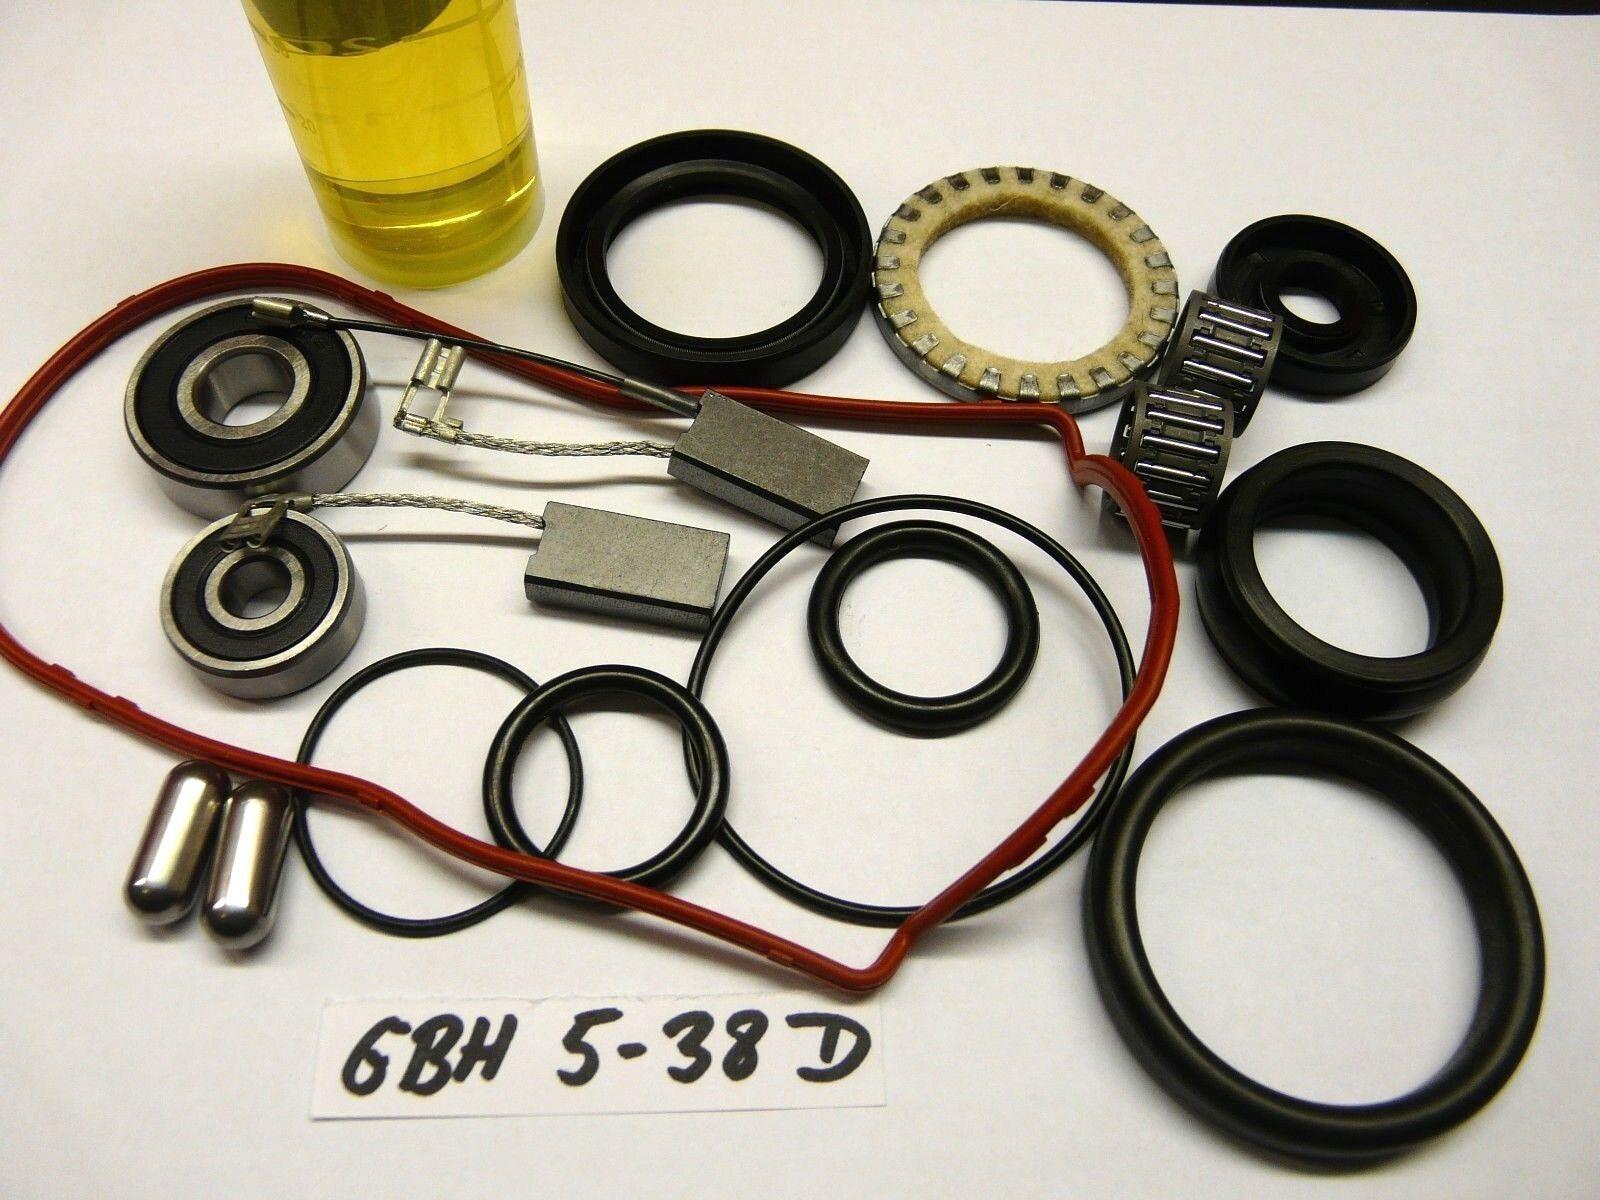 Bosch GBH 5-38 D , Reparatursatz, Verschleissteilesatz, Wartungset